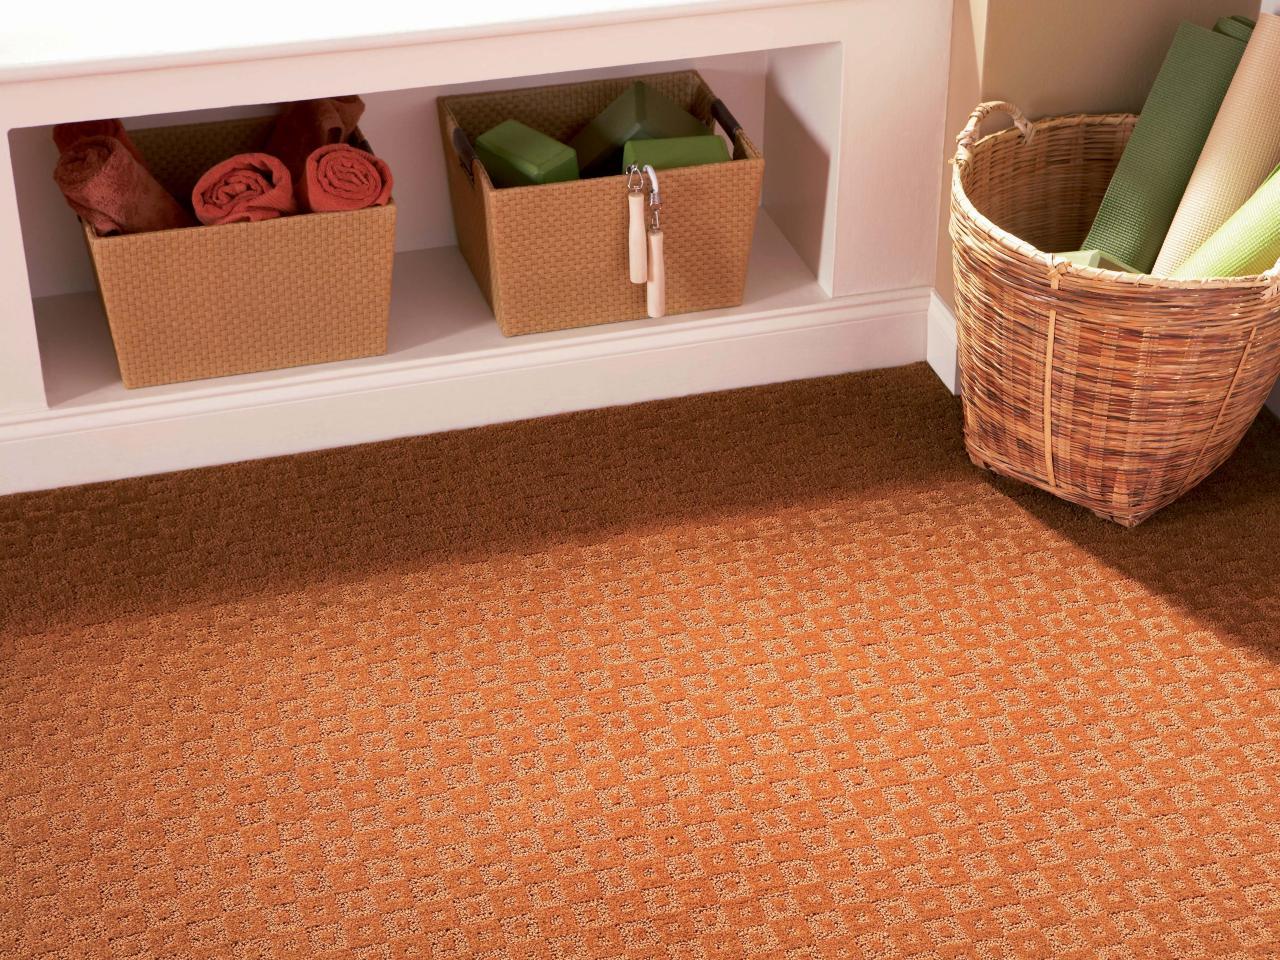 Family Room Carpet Ideas Part - 46: Carpet Basics: Durability And Judging Quality